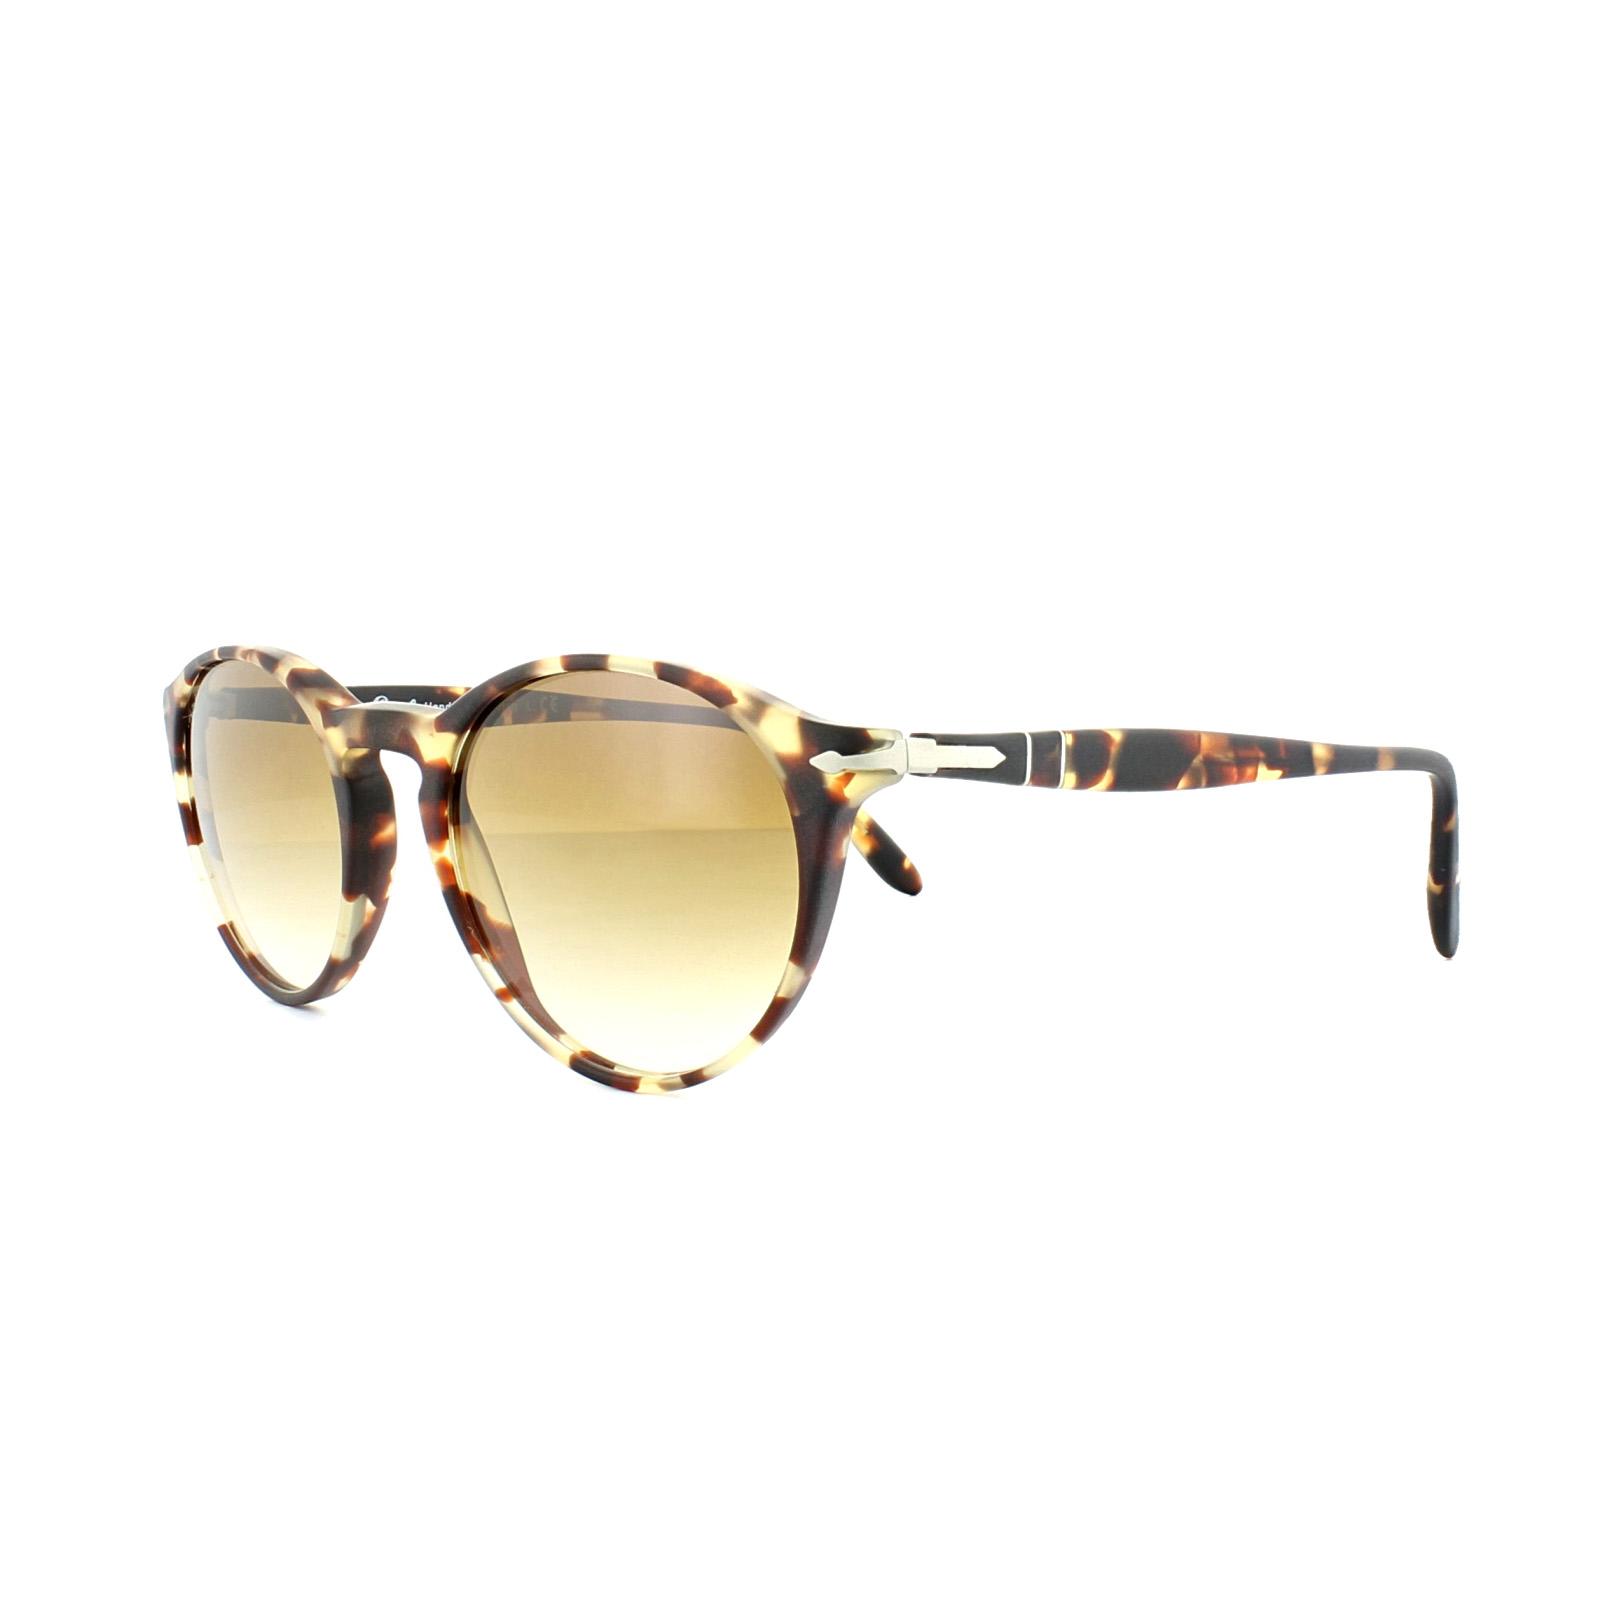 acd5e36bf086d Sentinel Persol Sunglasses 3092SM 900551 Tabacco Virginia Antique Brown  Gradient